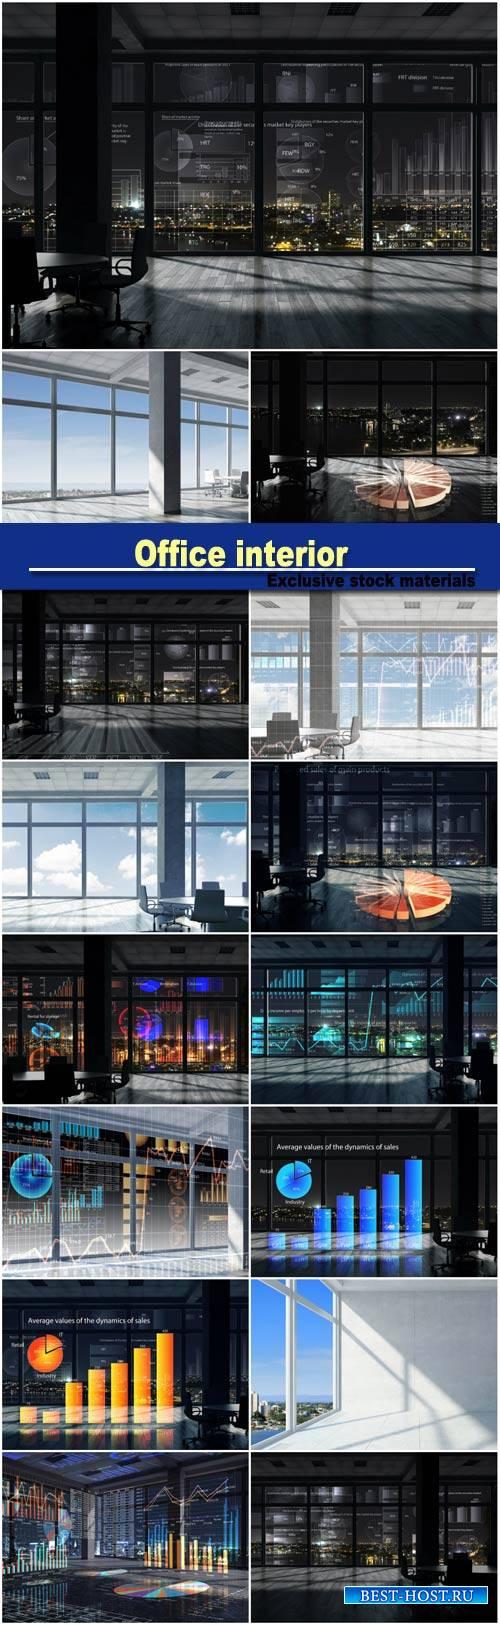 Night office interior, white office interior, mixed media